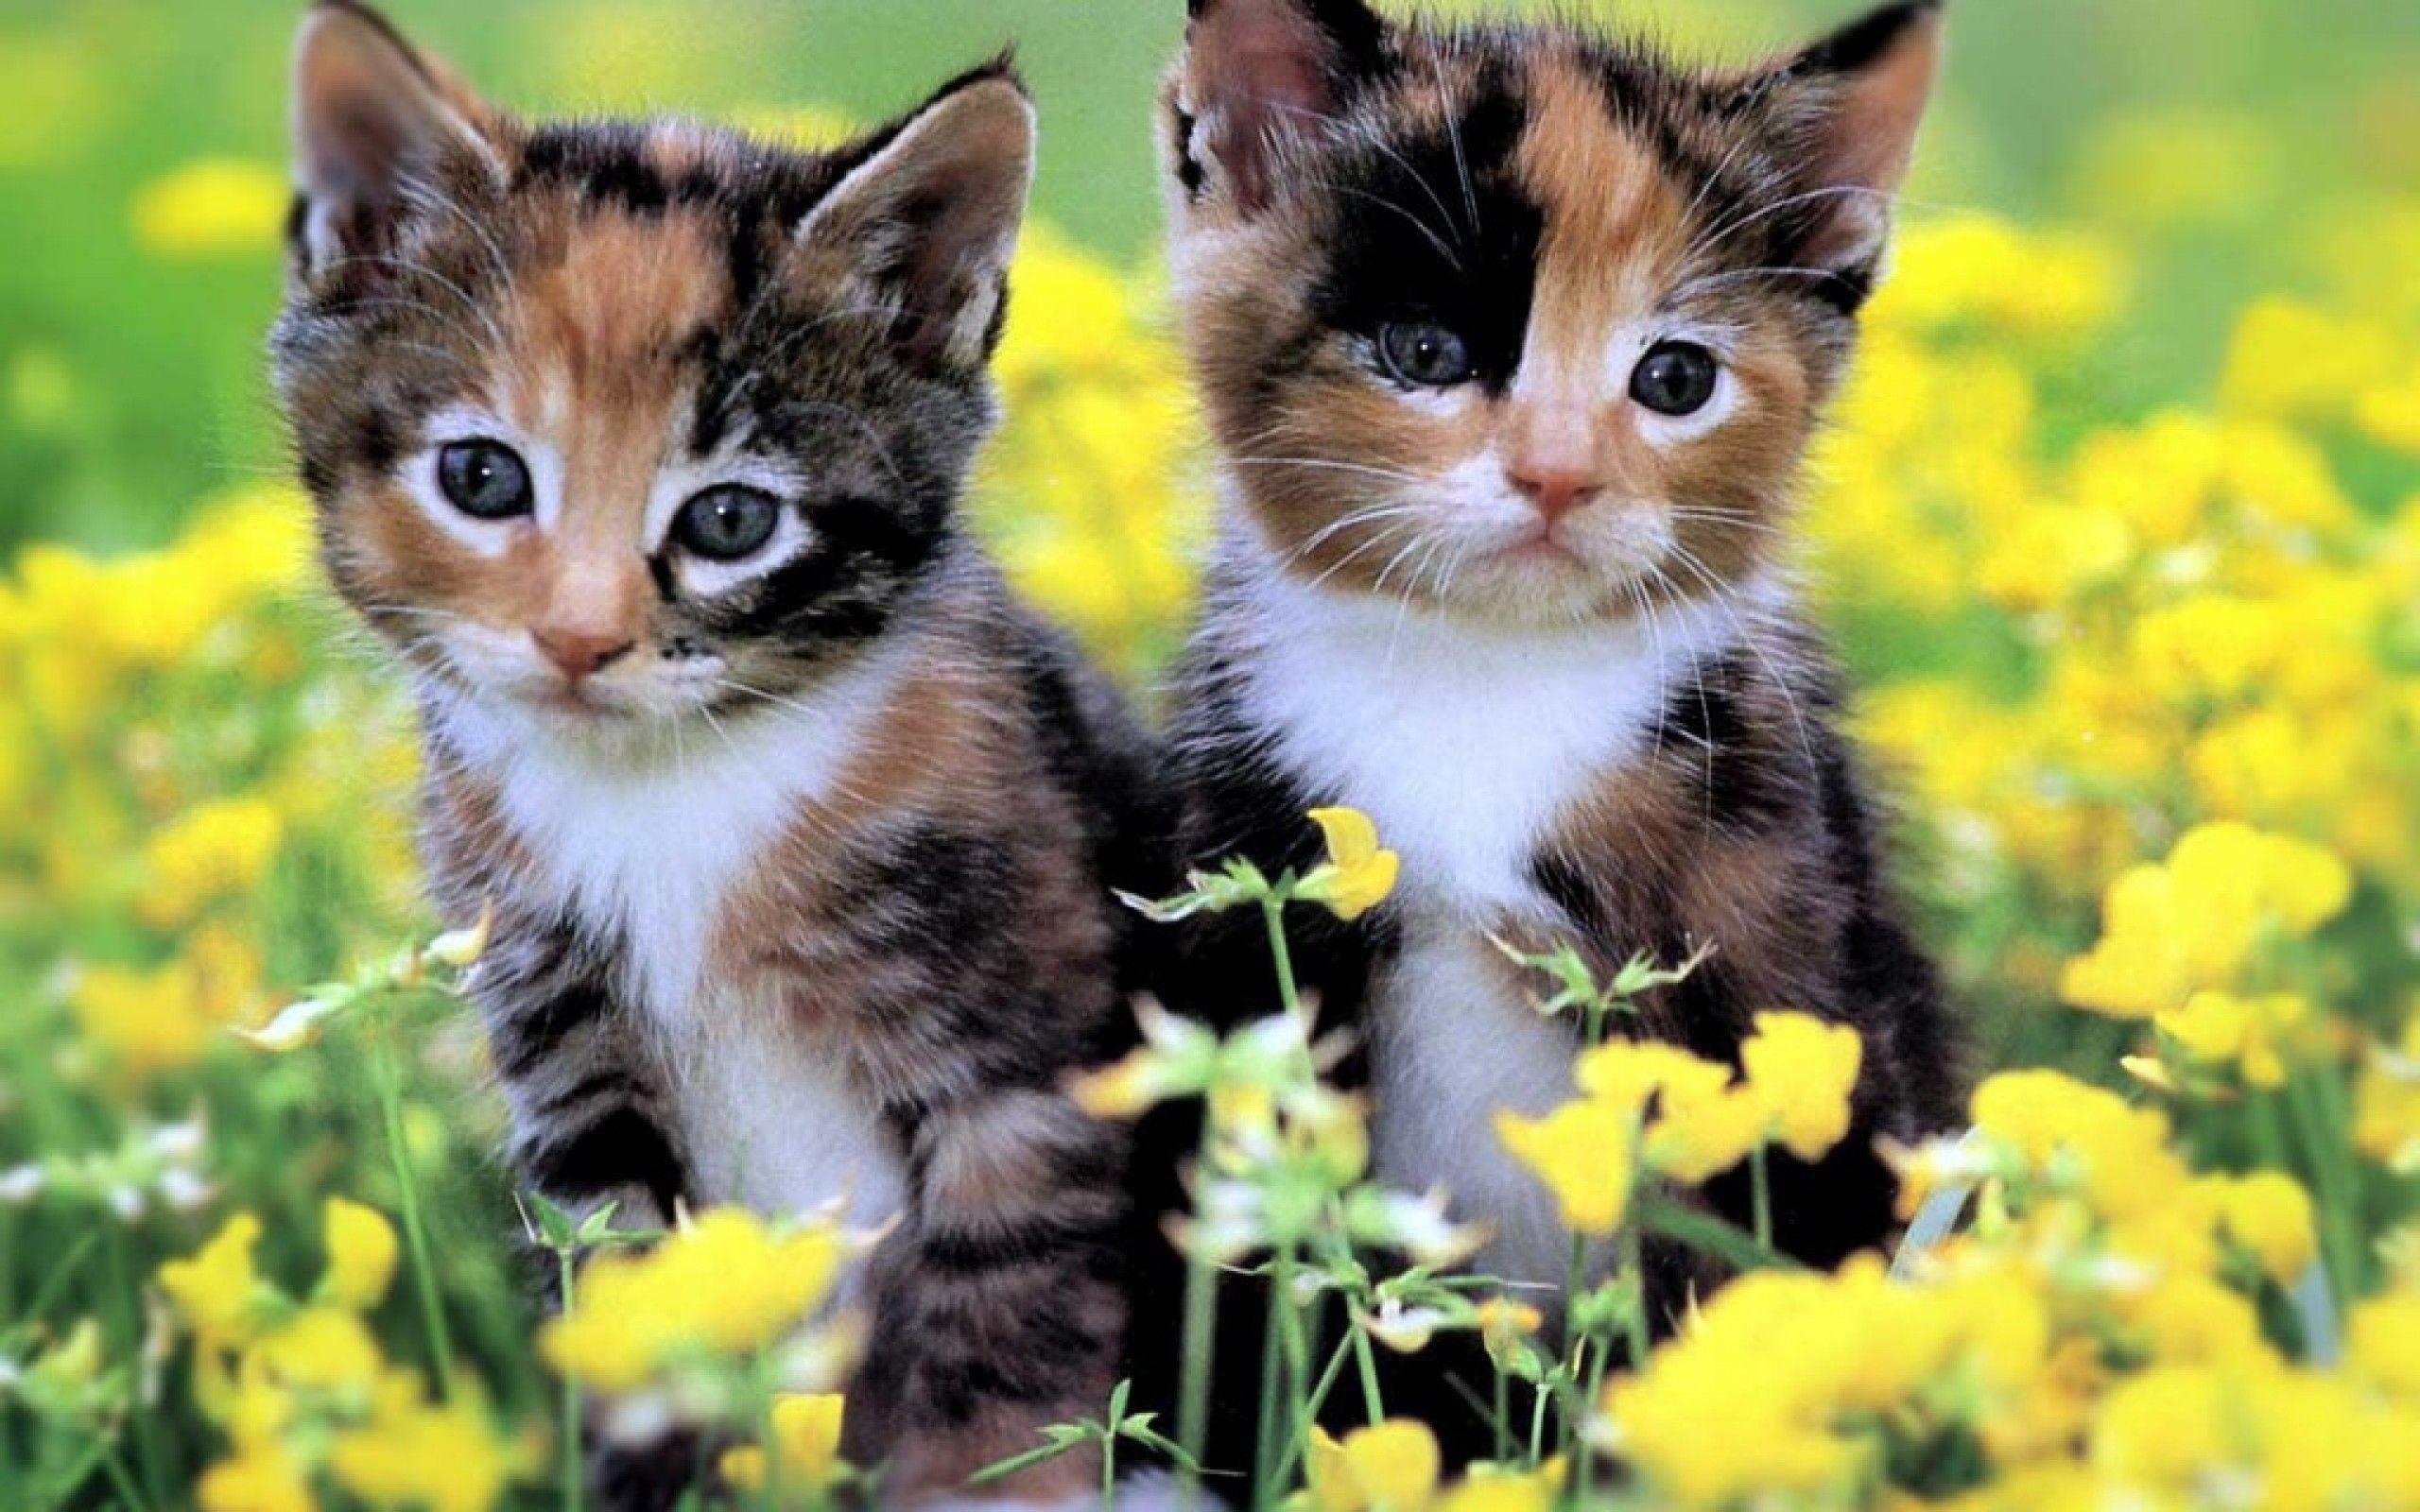 cute baby kittens wallpaper Homepage » Cat » two cute